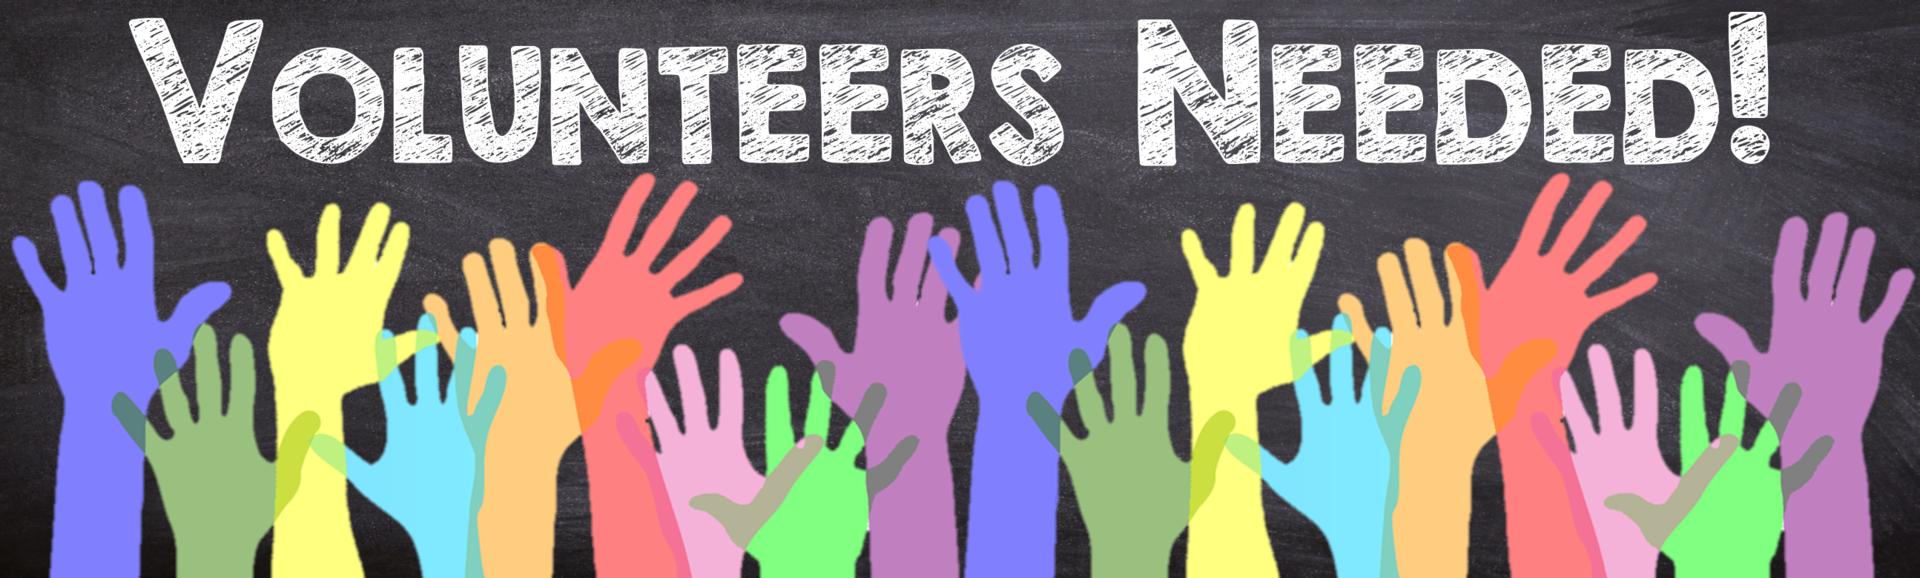 Volunteers Needed Header Image